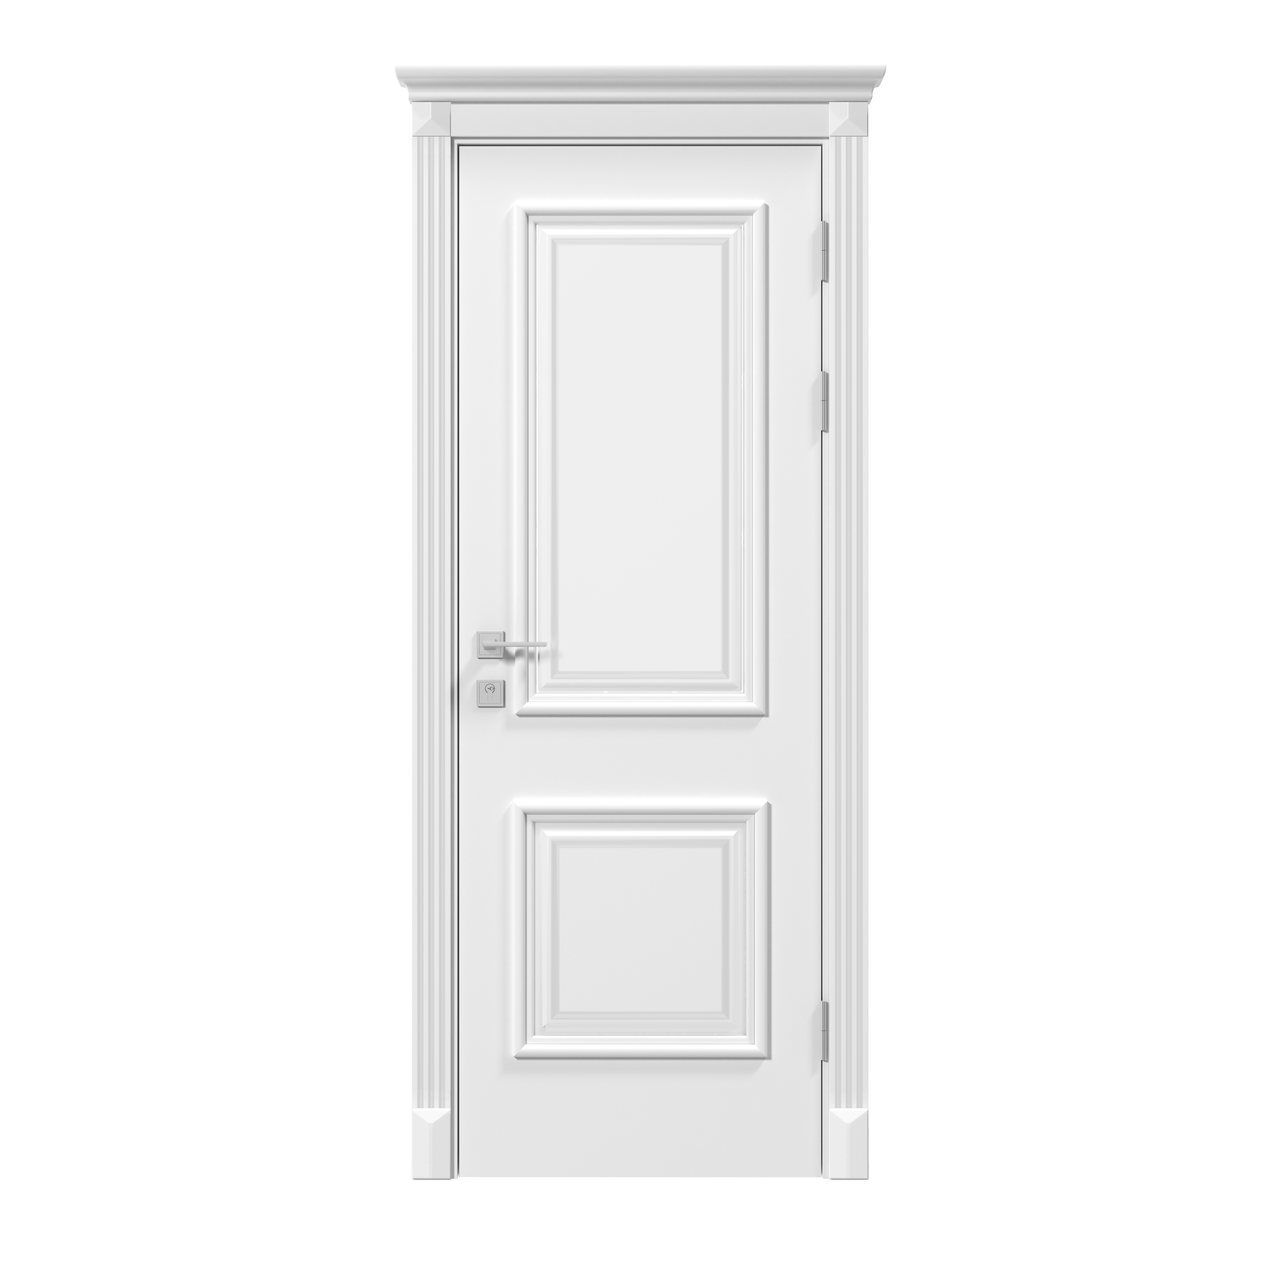 Двери Родос Siena Laura стекло RAL